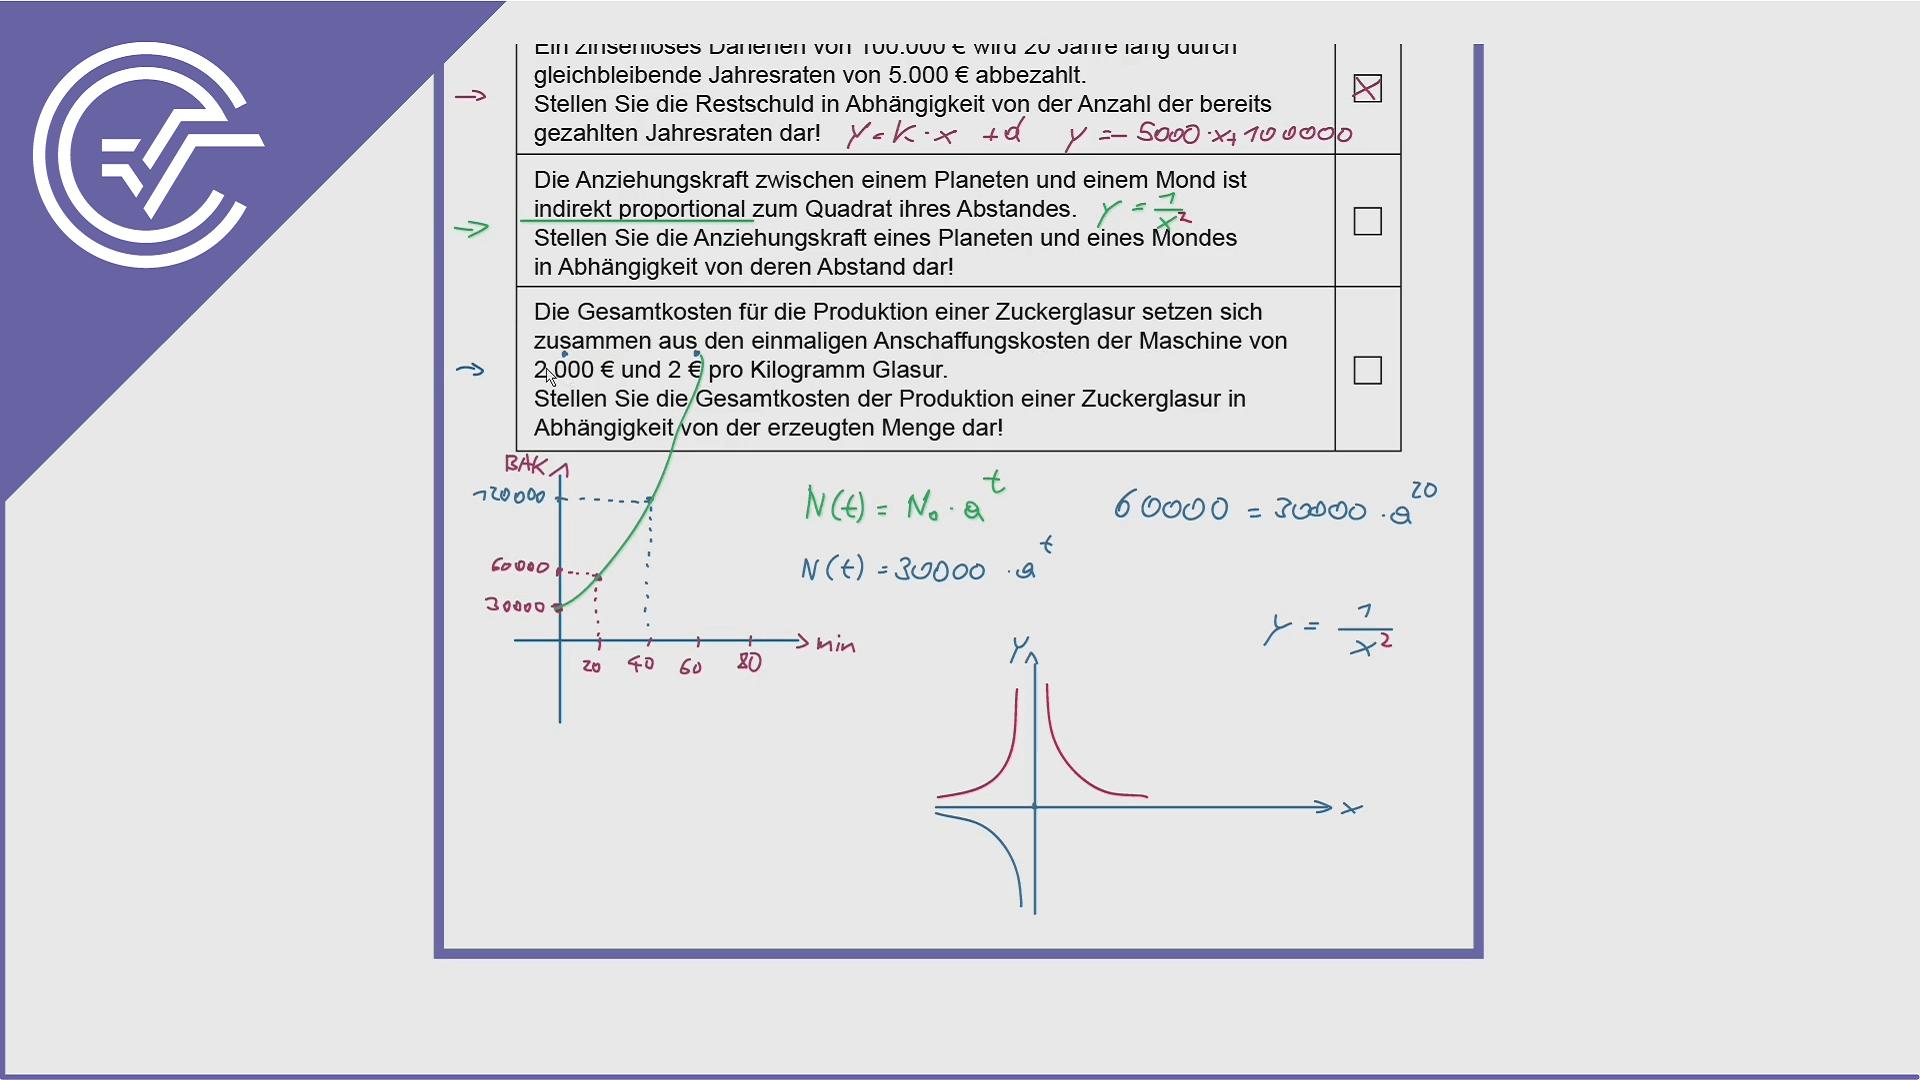 AHS Zentralmatura Aufgabe 8 - Lineare Funktionen